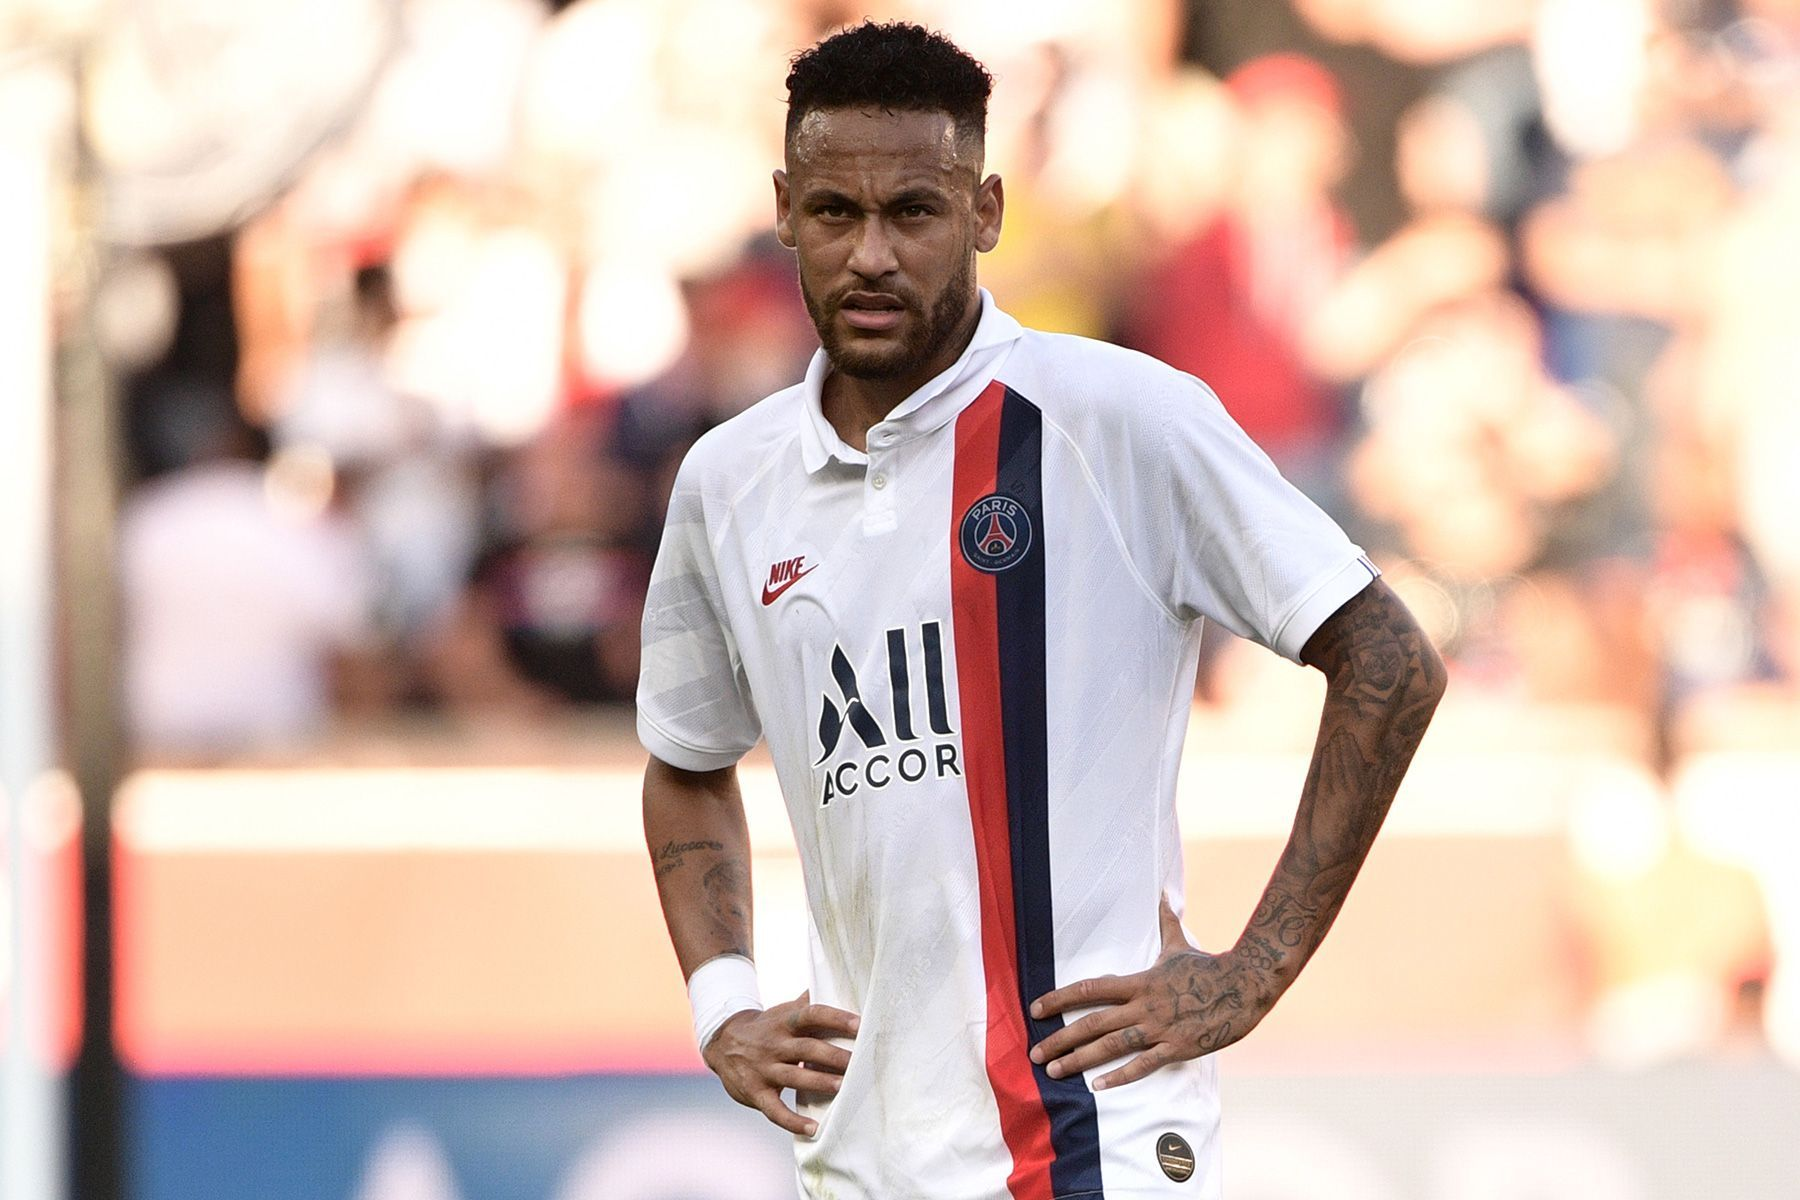 Neymar Jr Hd Images 2019 | Neymar, Neymar jr, Neymar football